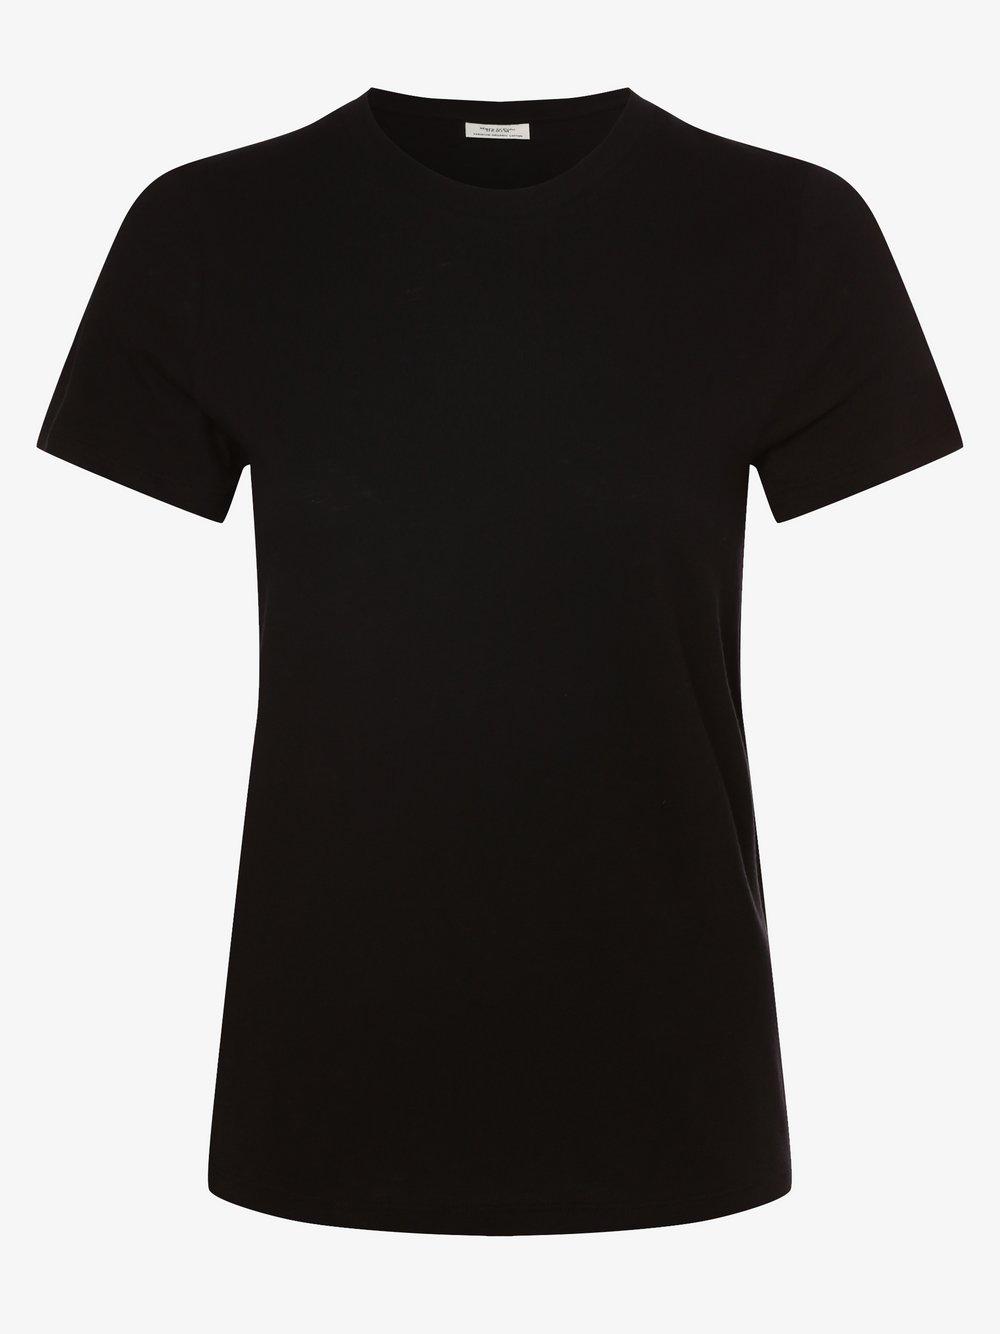 Marc O'Polo Denim – T-shirt damski, czarny Van Graaf 488466-0002-09960